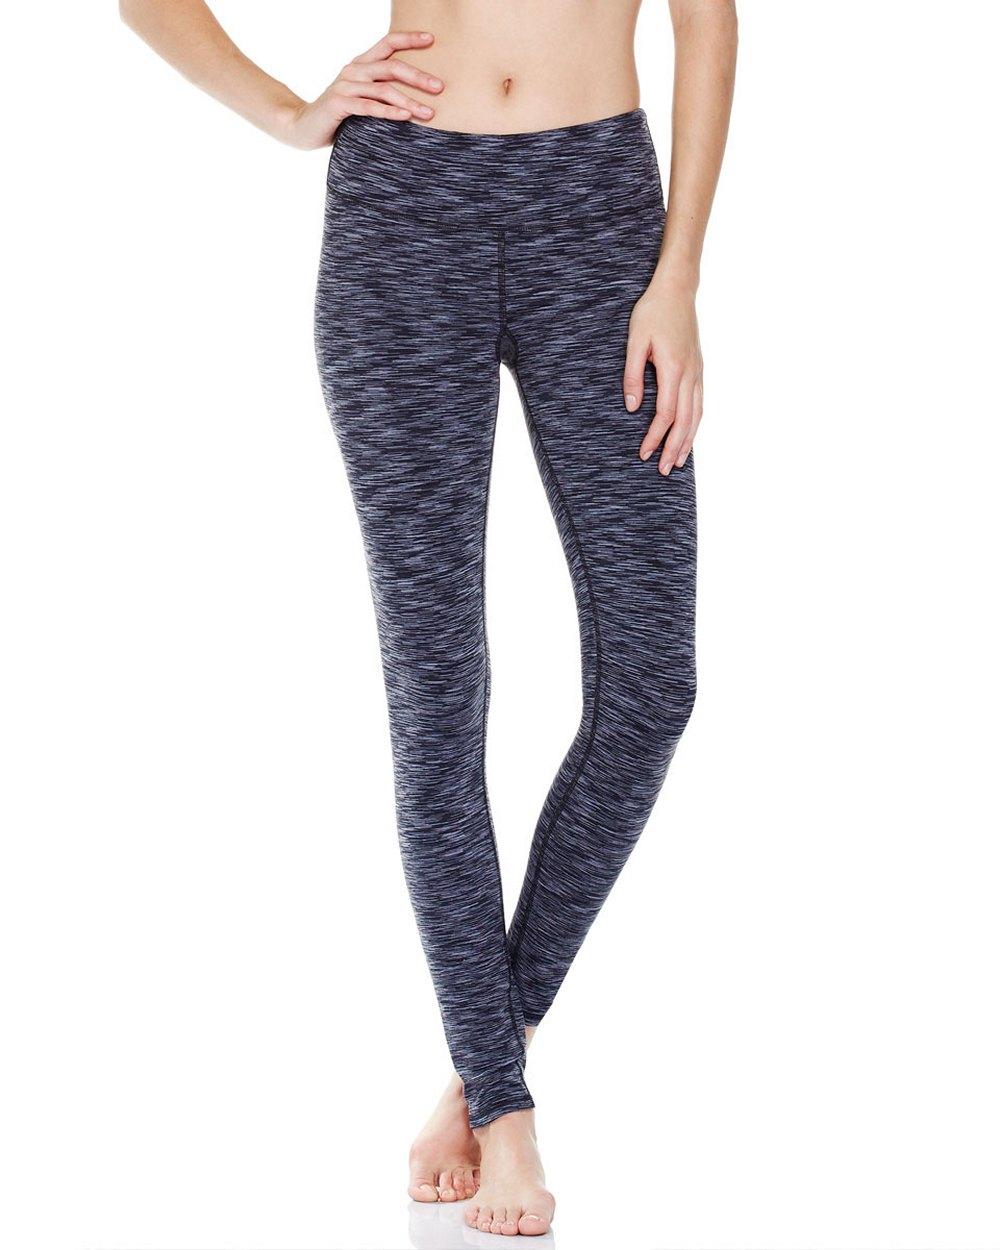 Alo Yoga Airbrushed Leggings Best Yoga Pants